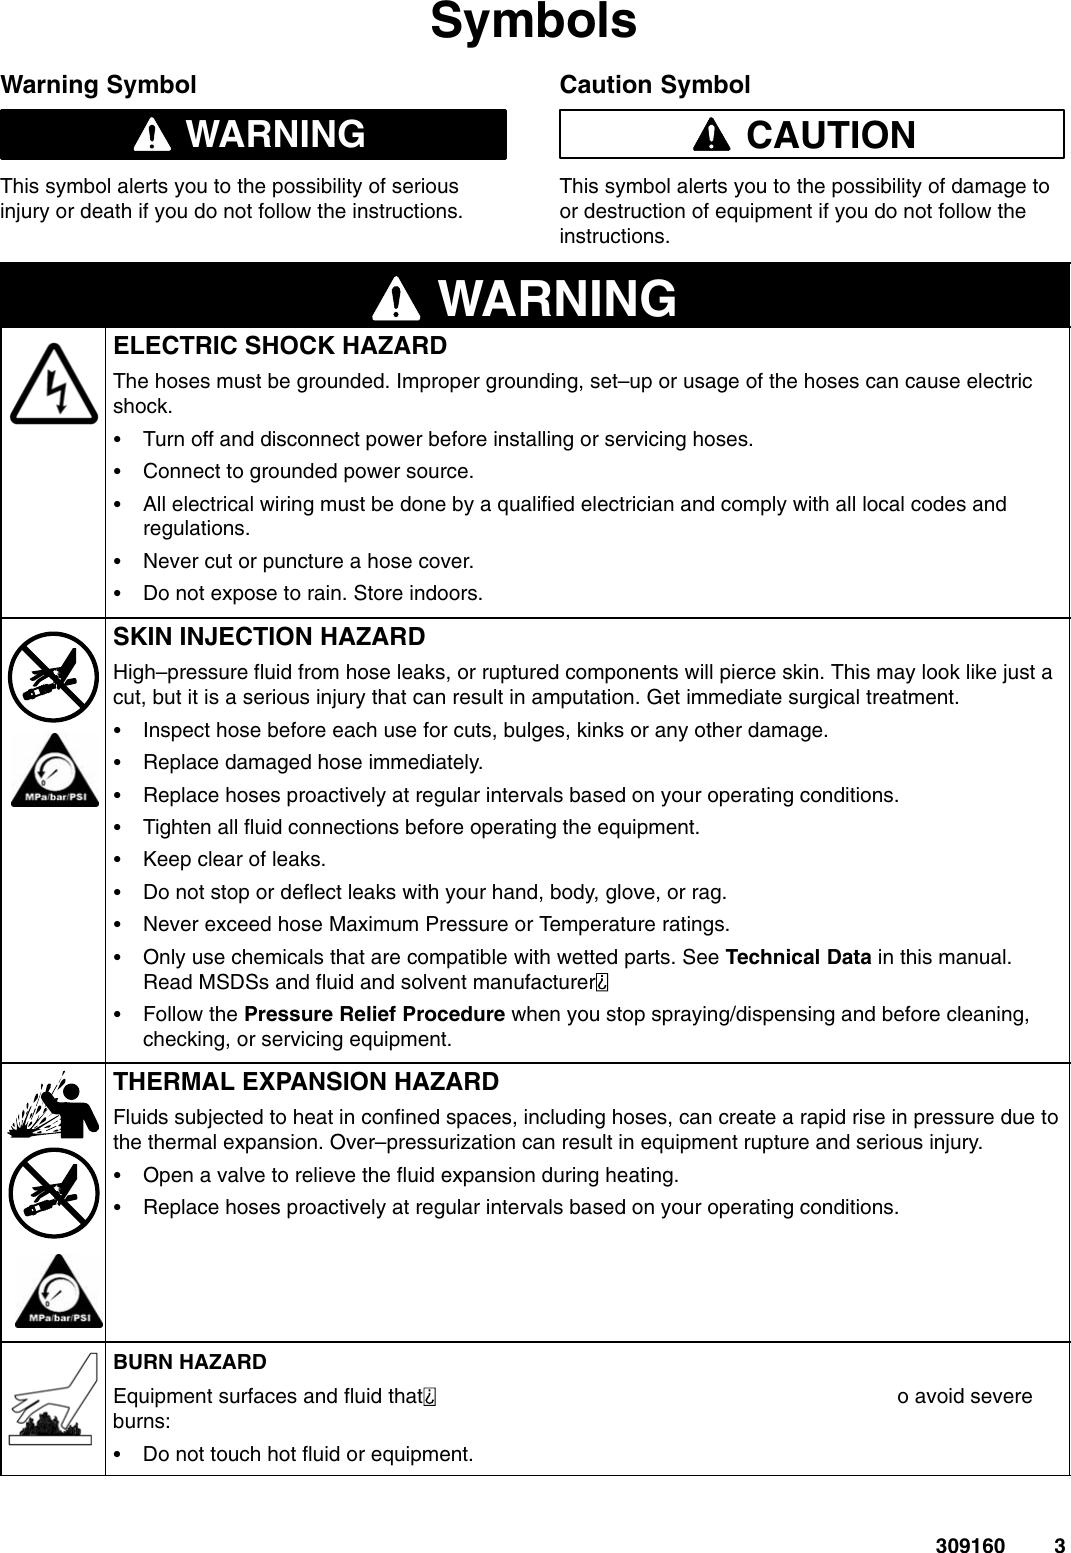 Dorable Electrician Symbol Adornment - Electrical Diagram Ideas ...